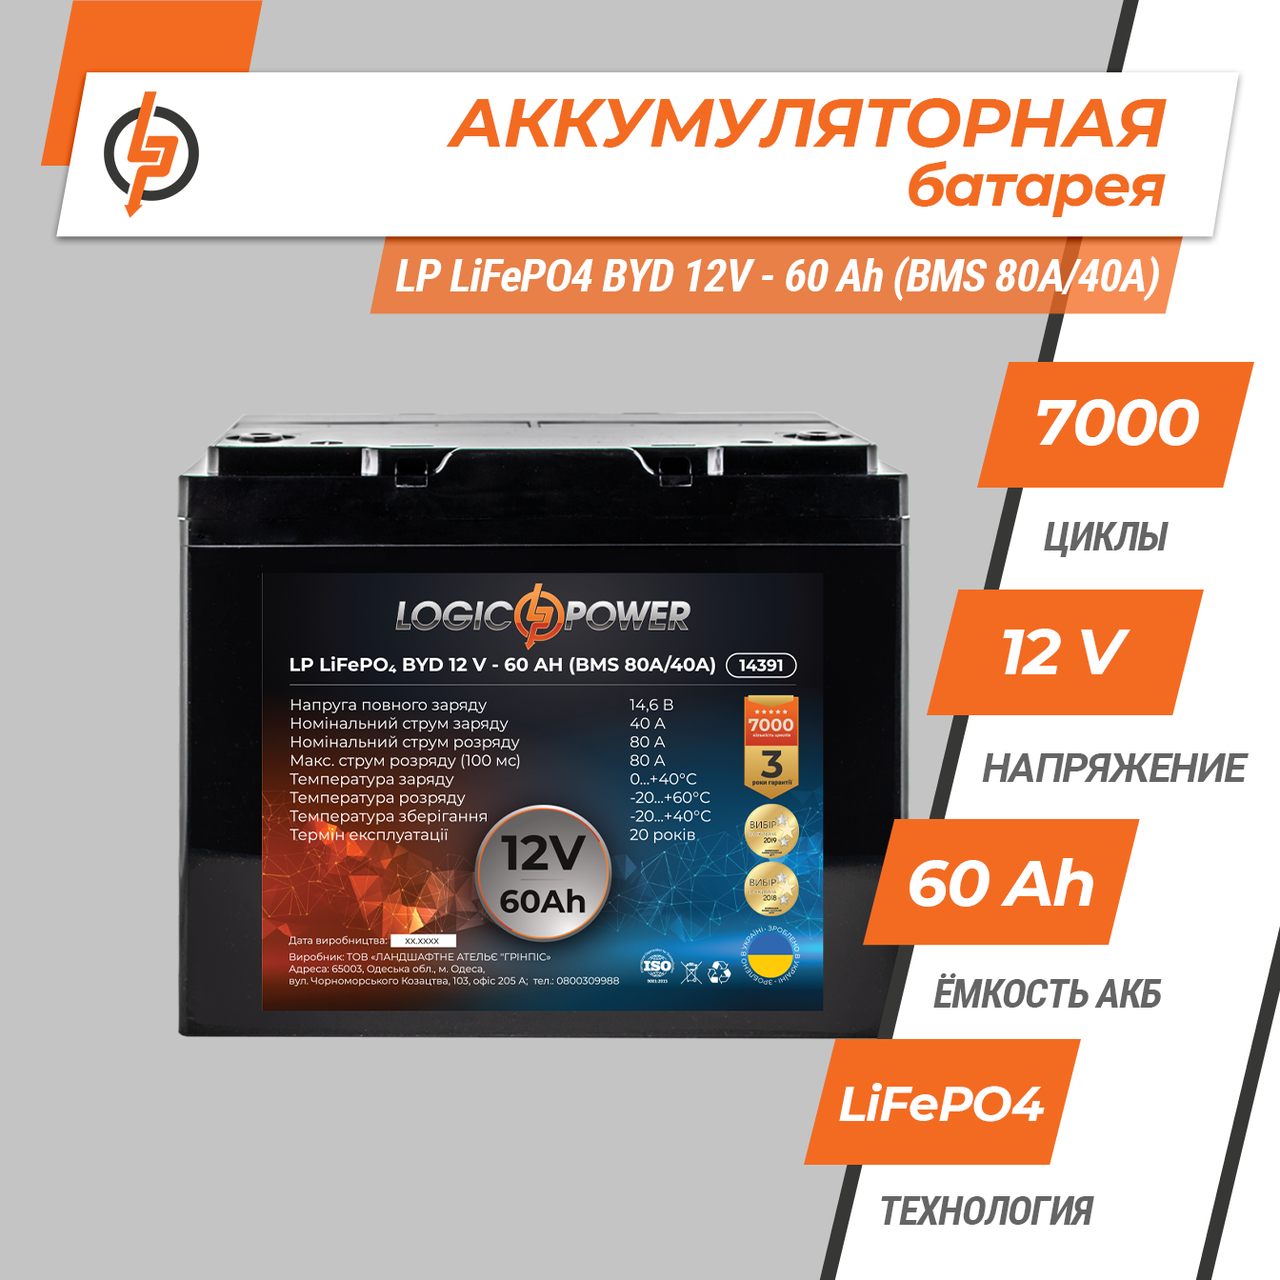 Акумулятор LP LiFePO4 BYD 12V 60 Ah BMS 80A/40А) пластик